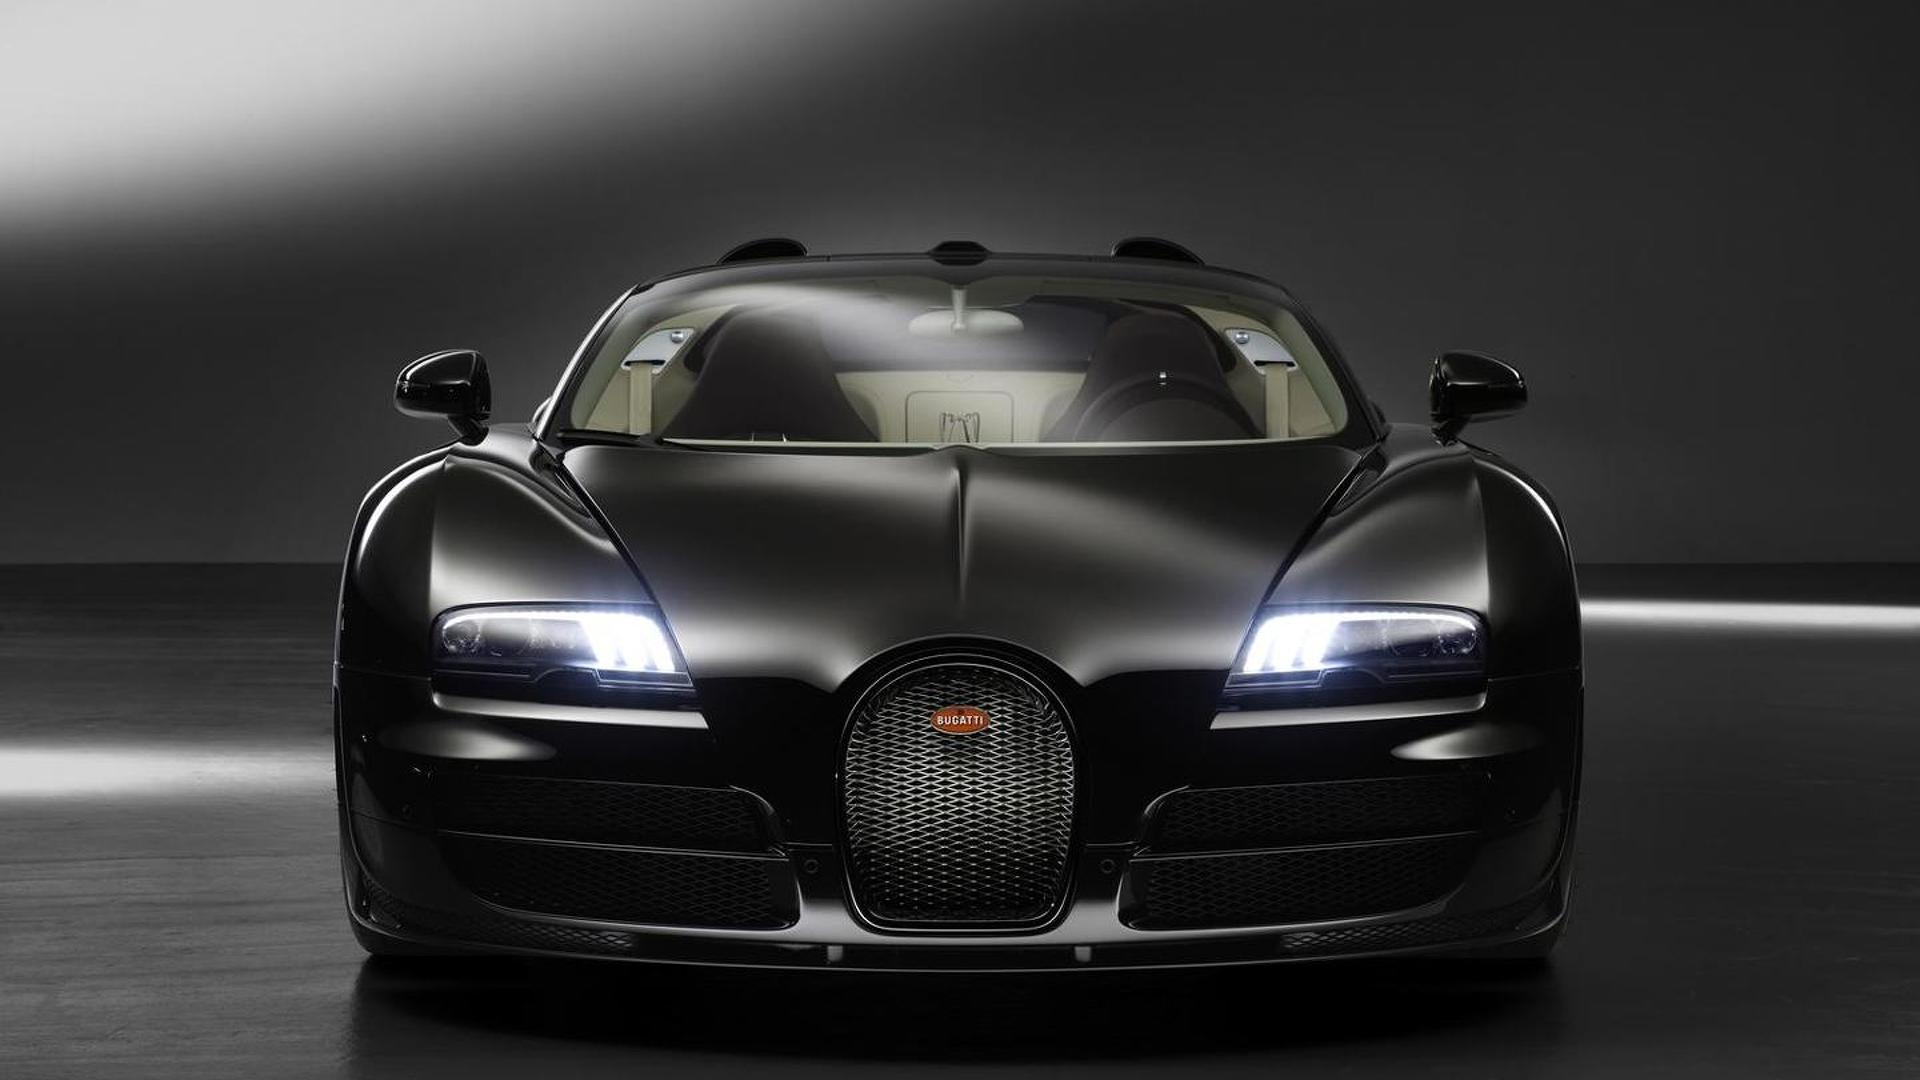 2013-409124-bugatti-veyron-grand-sport-vitesse-jean-bugatti-special-edition-09-09-20131 Wonderful Bugatti Veyron Grand Sport Vitesse Mansory Vivere 2014 Cars Trend